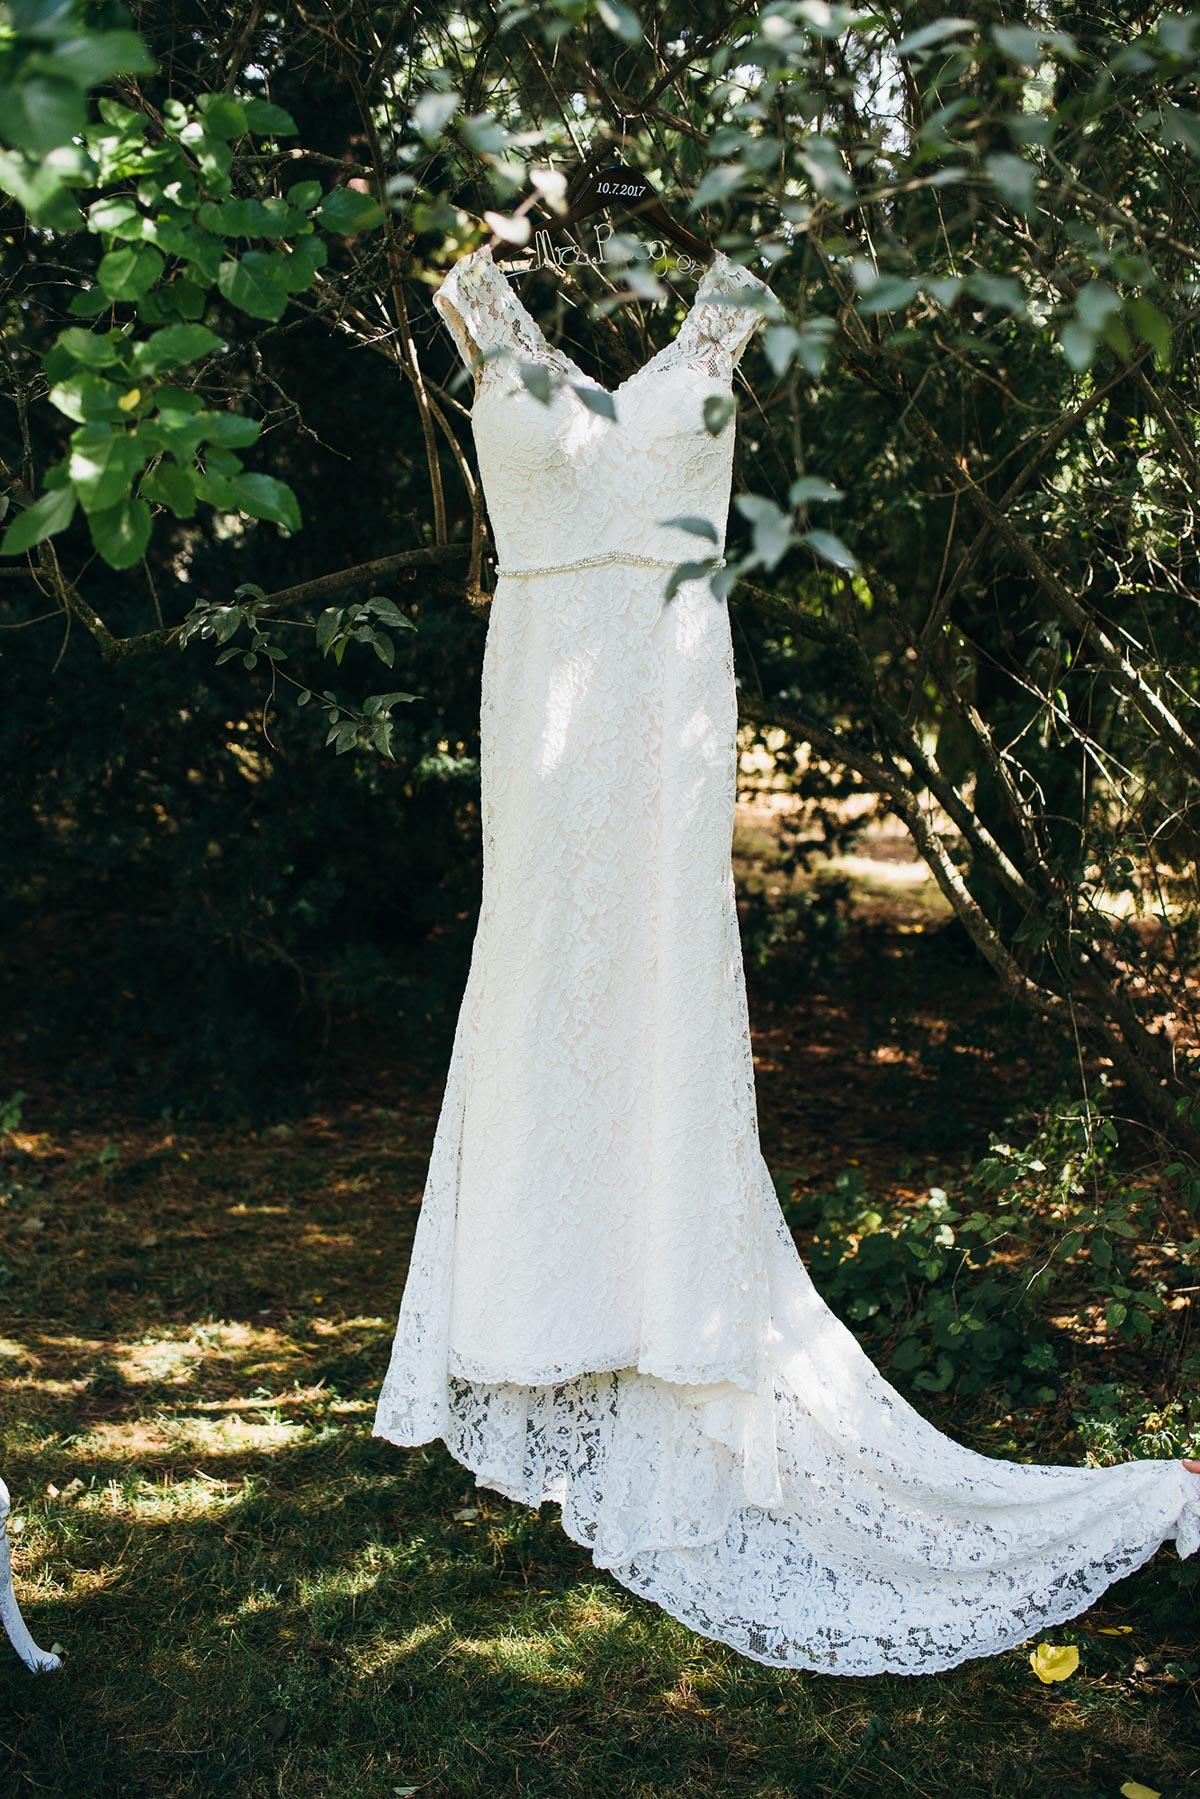 shaw-events-vineyard-bride-swish-list-kurtz-orchards-niagara-on-the-lake-wedding-23.jpg